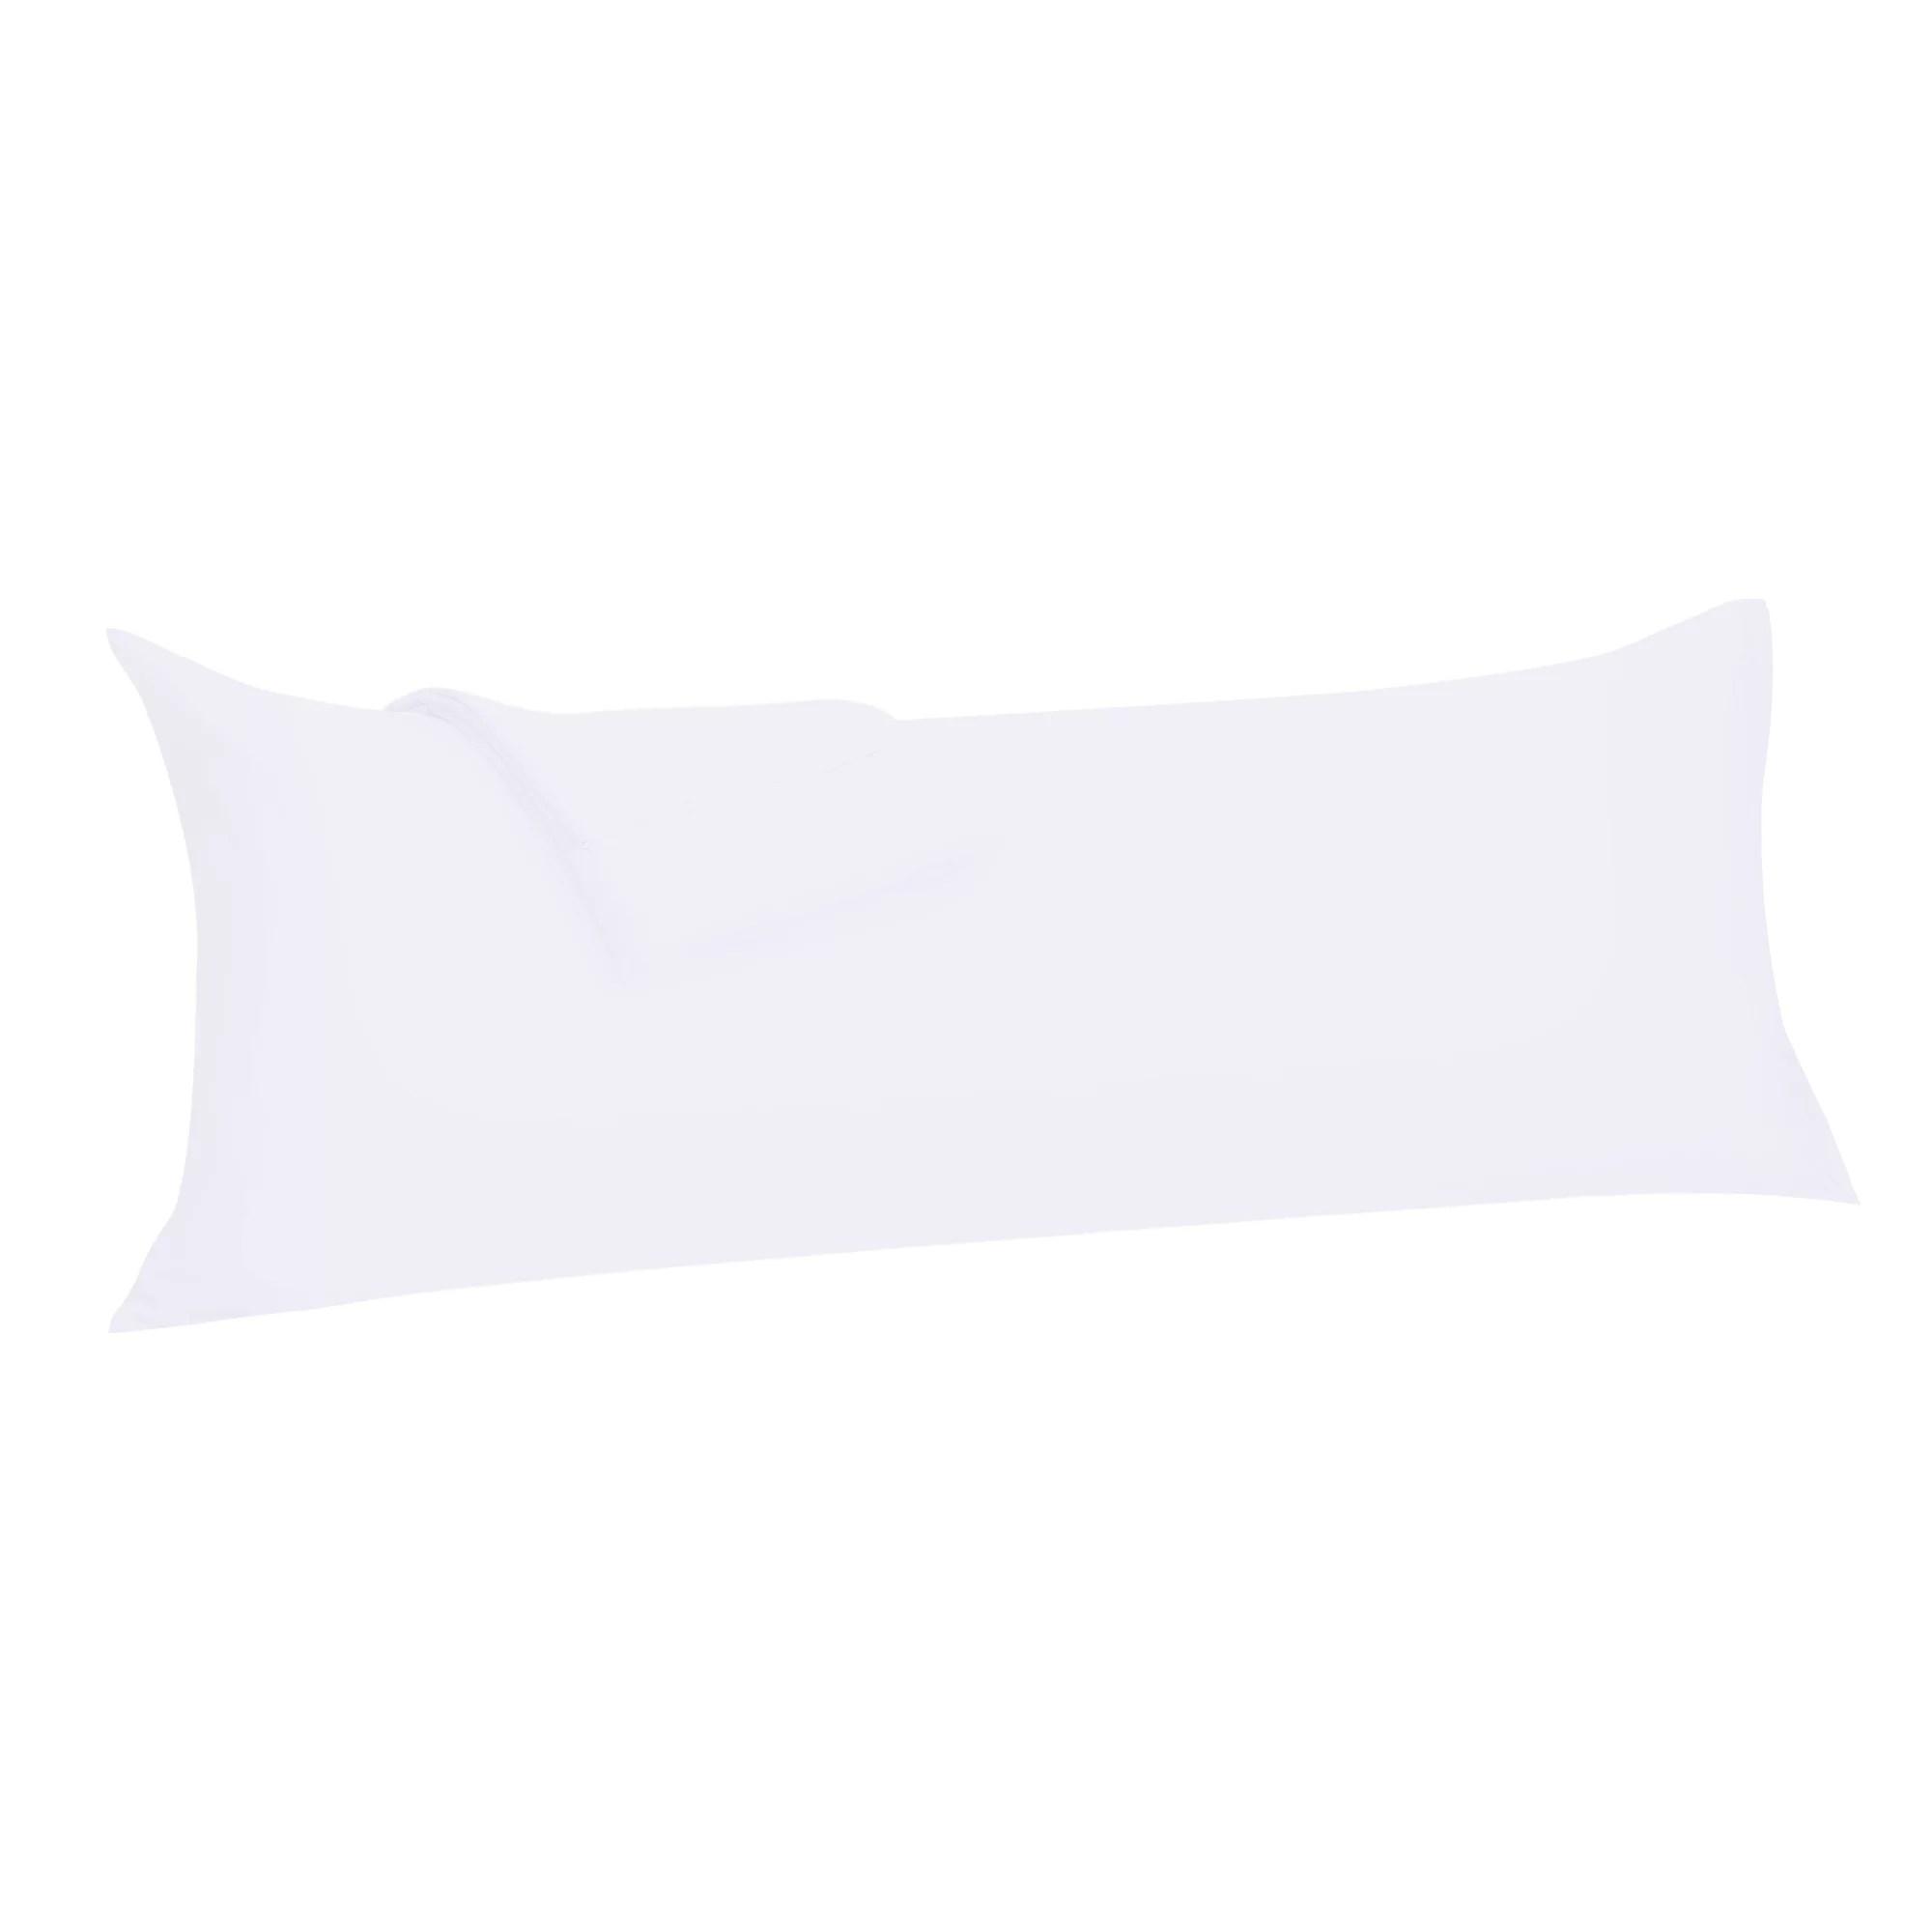 comfortable soft pillowcase pillow case cover with zipper microfiber white 20 x72